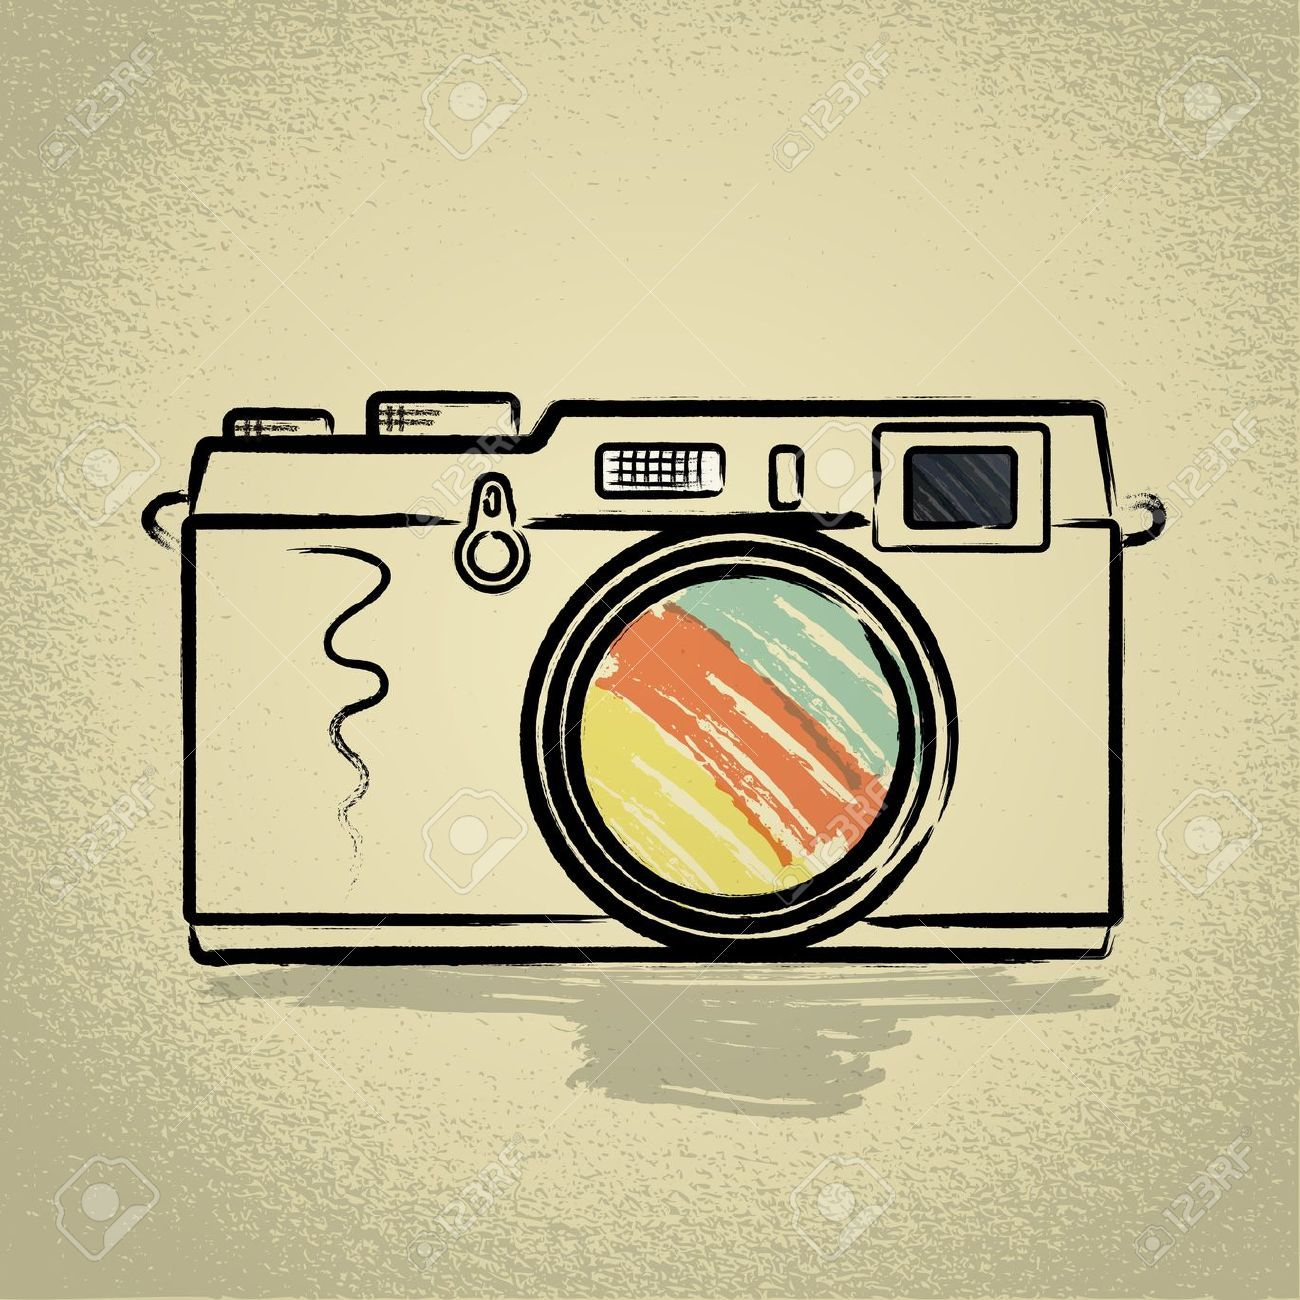 camara fotografica ilustracion - buscar con google | photography